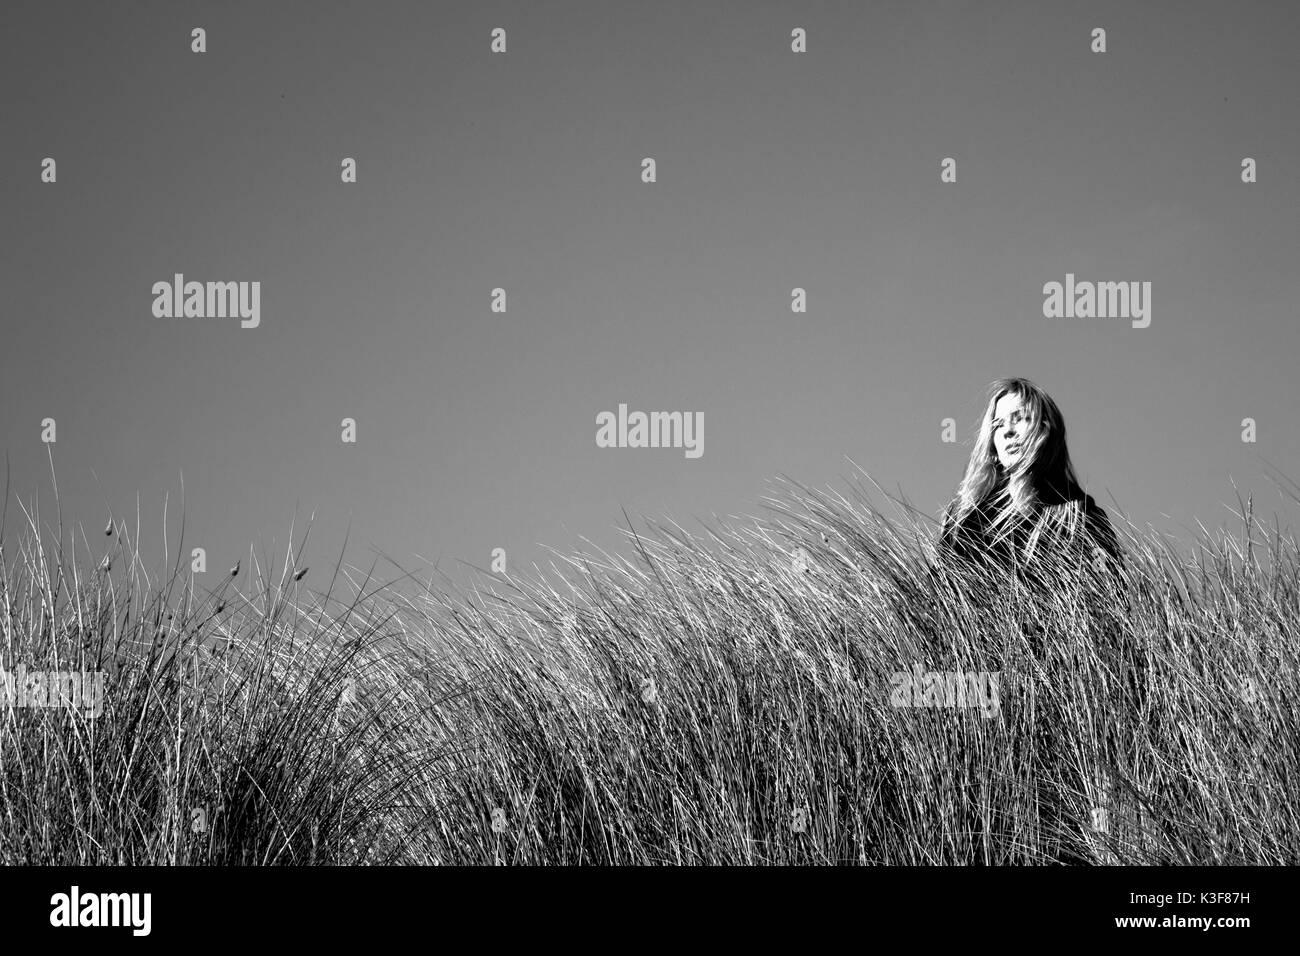 Portrait of Woman Standing Amongst Tall Grass - Stock Image